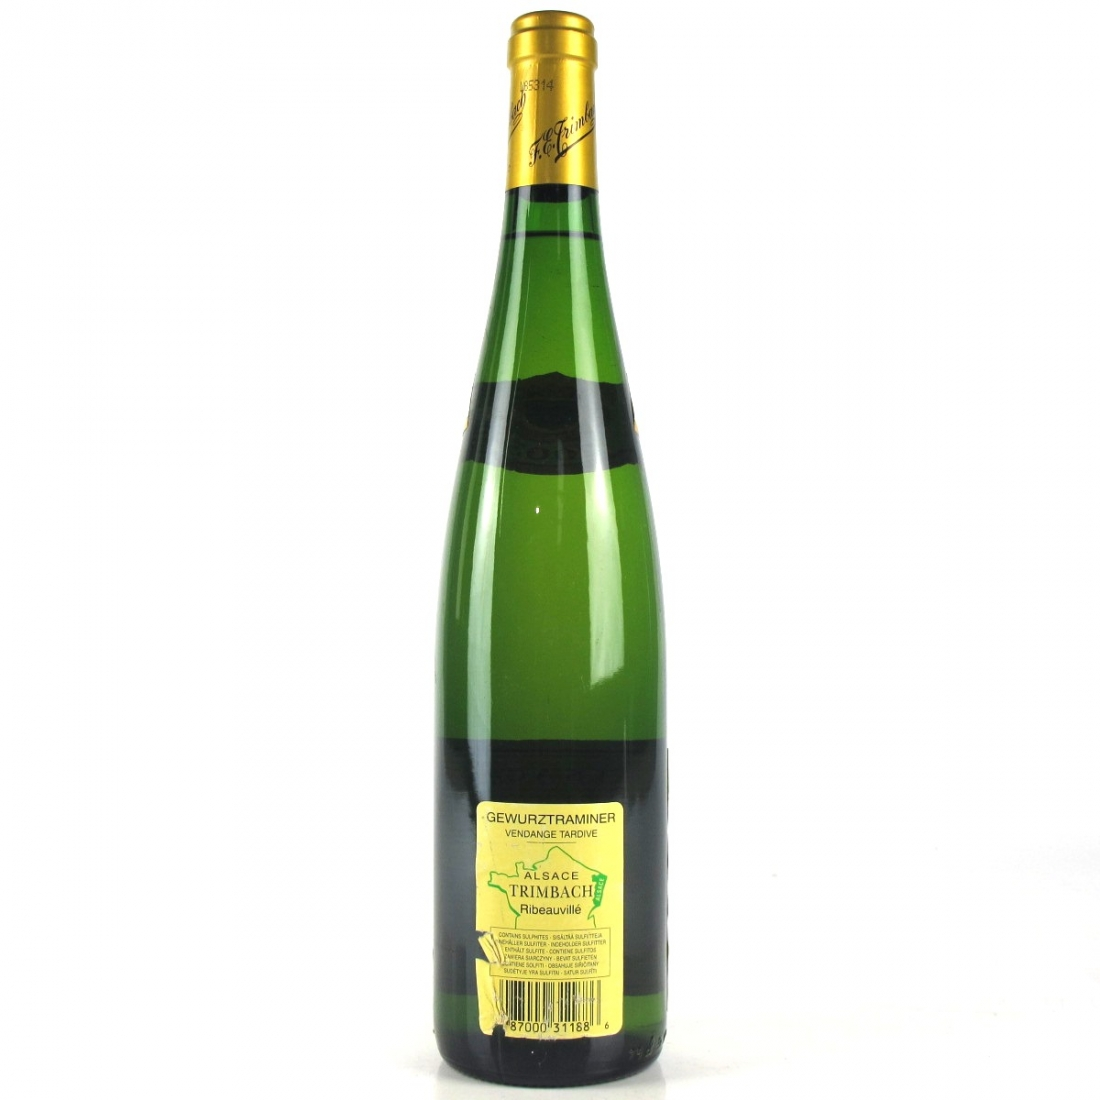 Trimbach Vendange Tardive Gewurztraminer 2003 Alsace